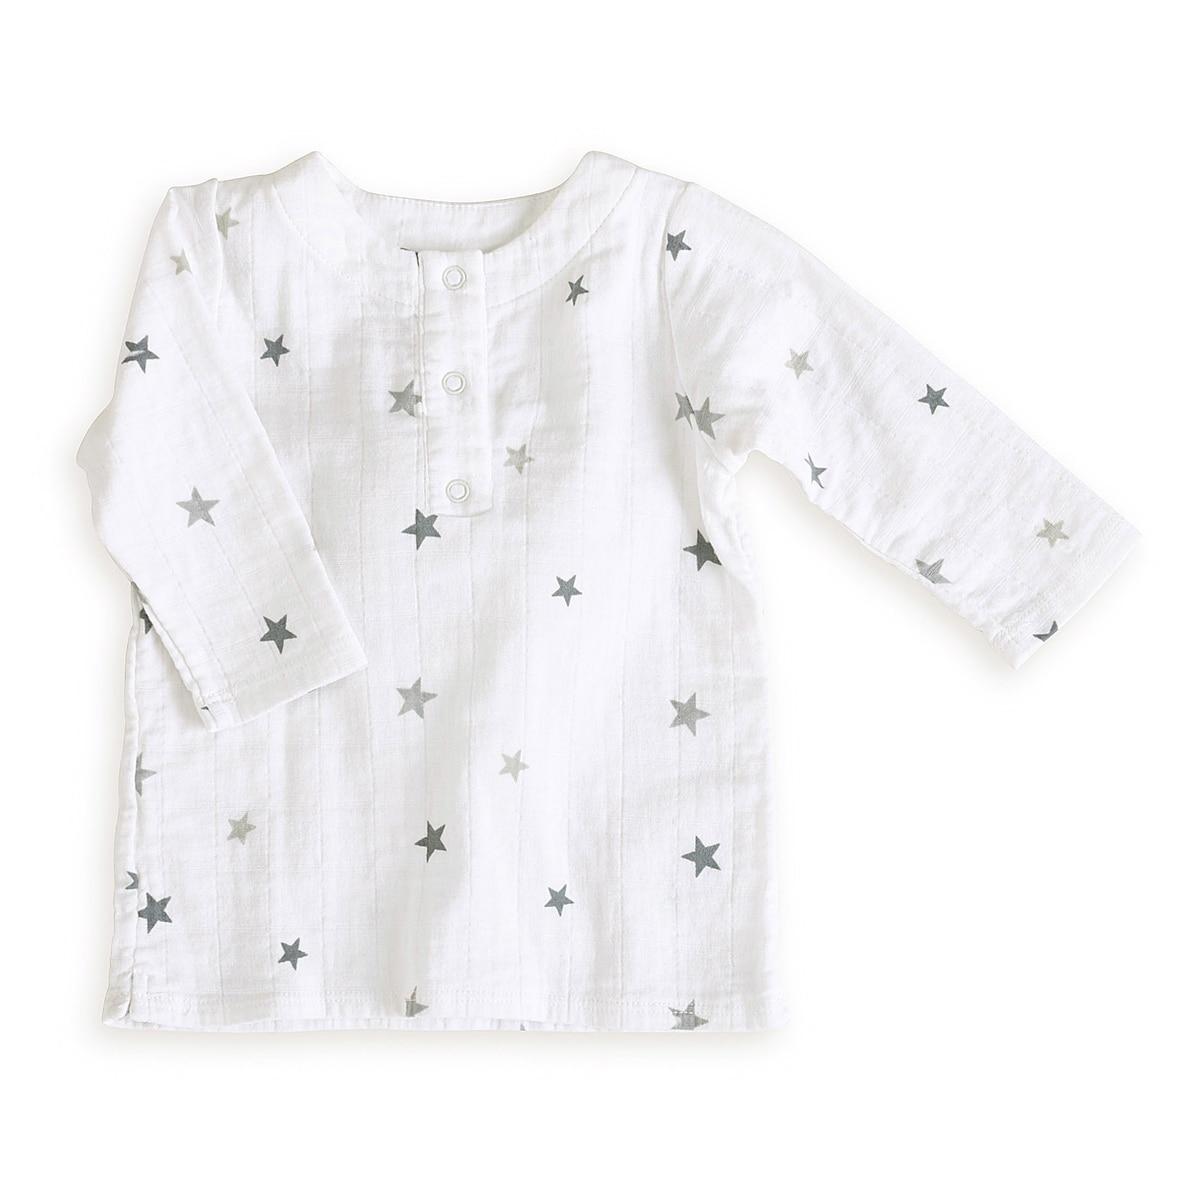 aden + anais Boys 3-6 Months Twinkle Tiny Star Muslin Tunic Top